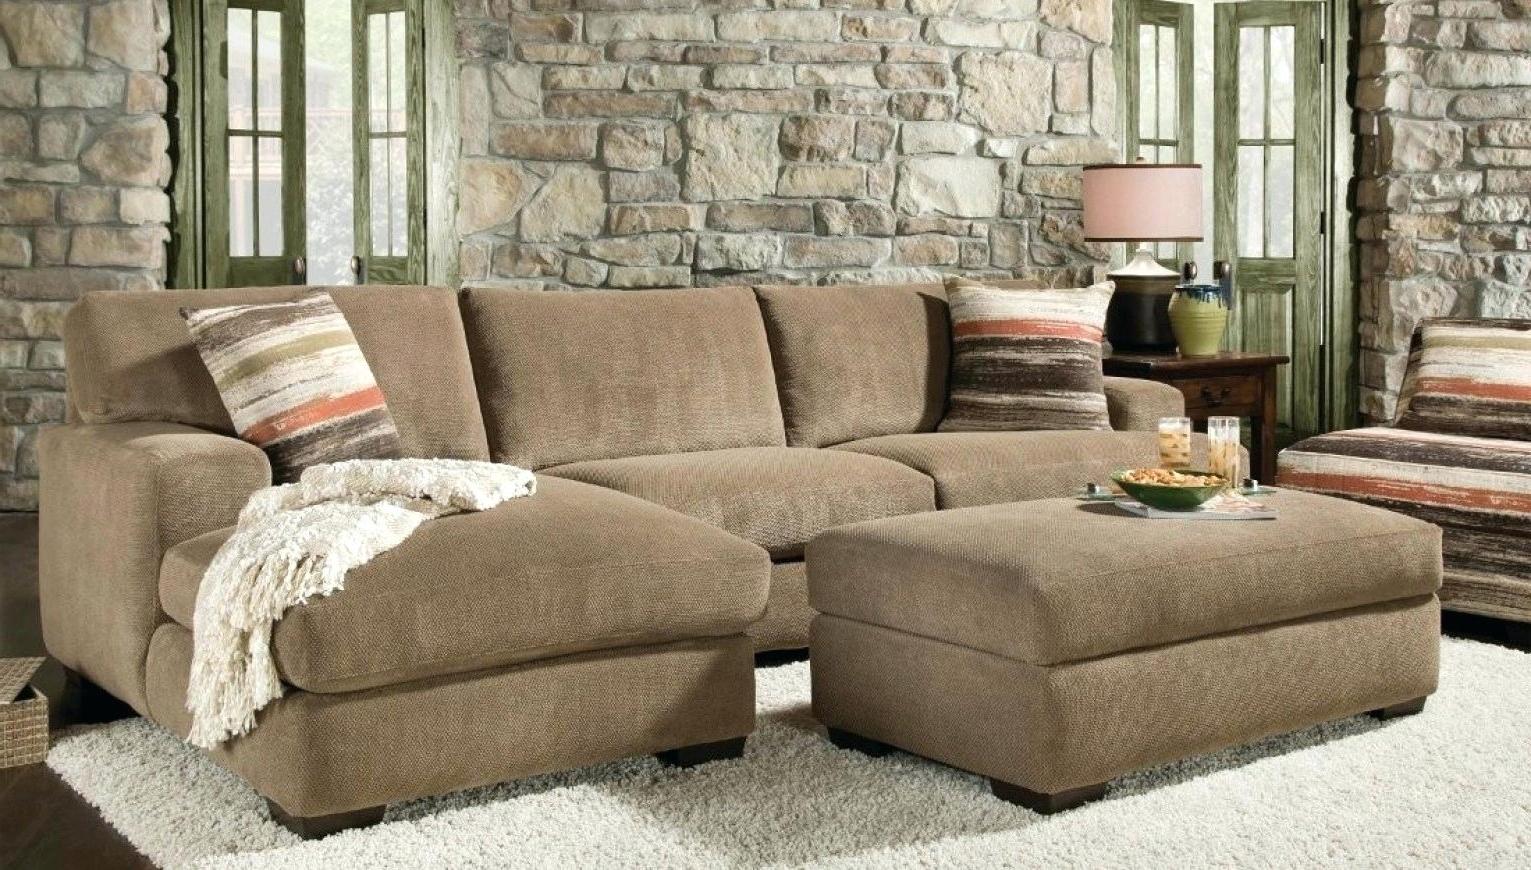 Popular Huge Sofas Intended For Oversized Sectional Sofa Sa Sas Bed Huge Sofas Sleeper (View 11 of 15)